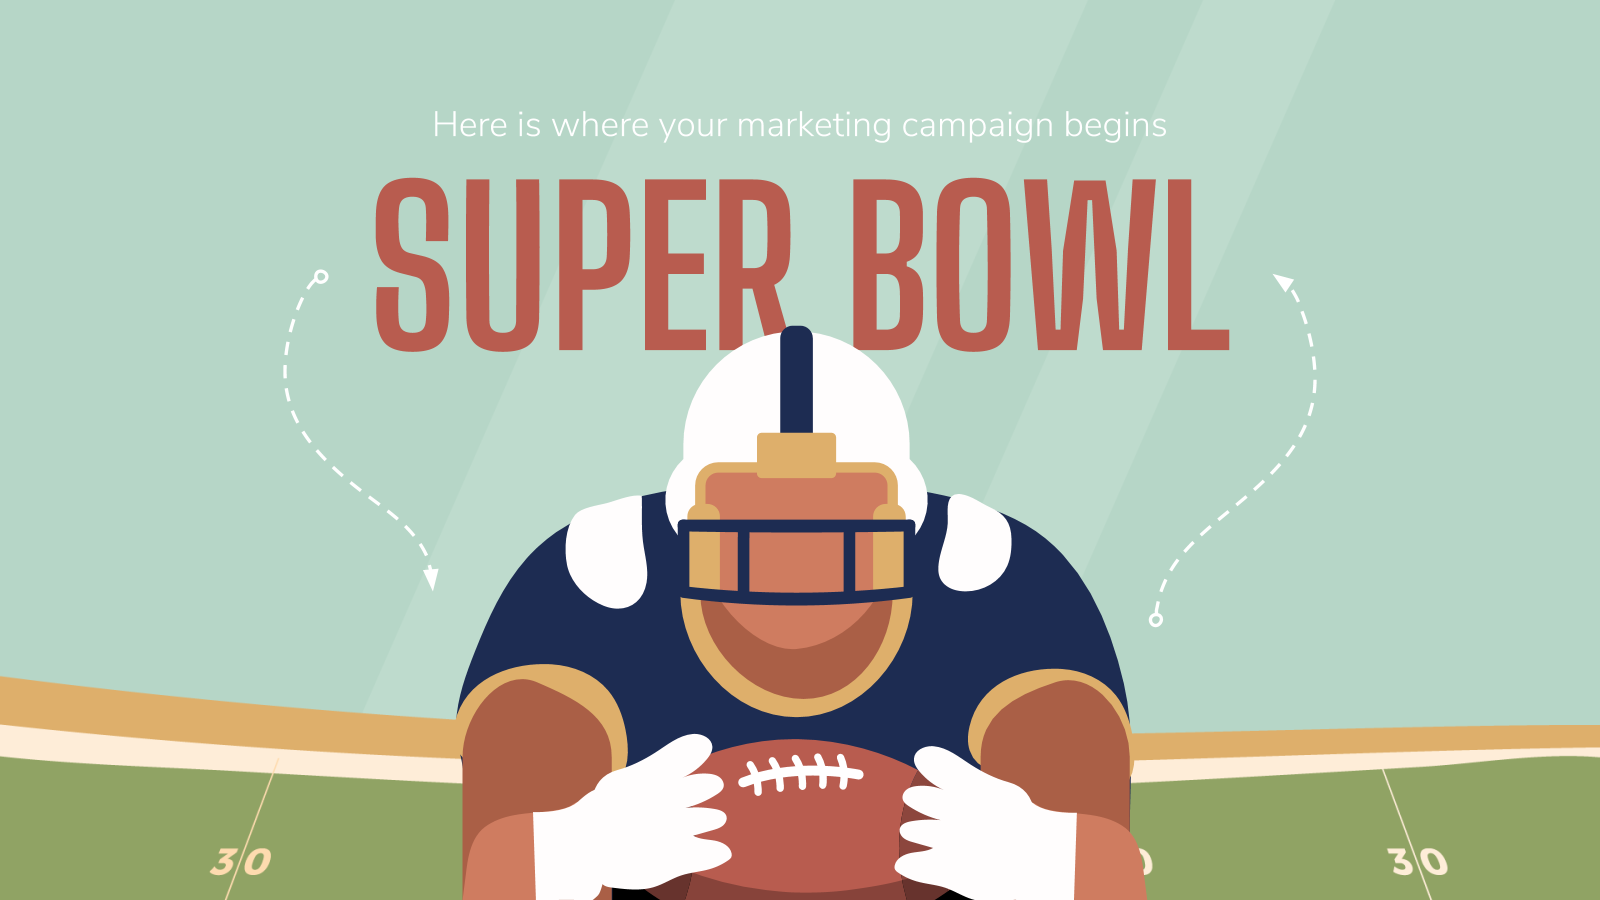 Super Bowl Marketing Campaign presentation template